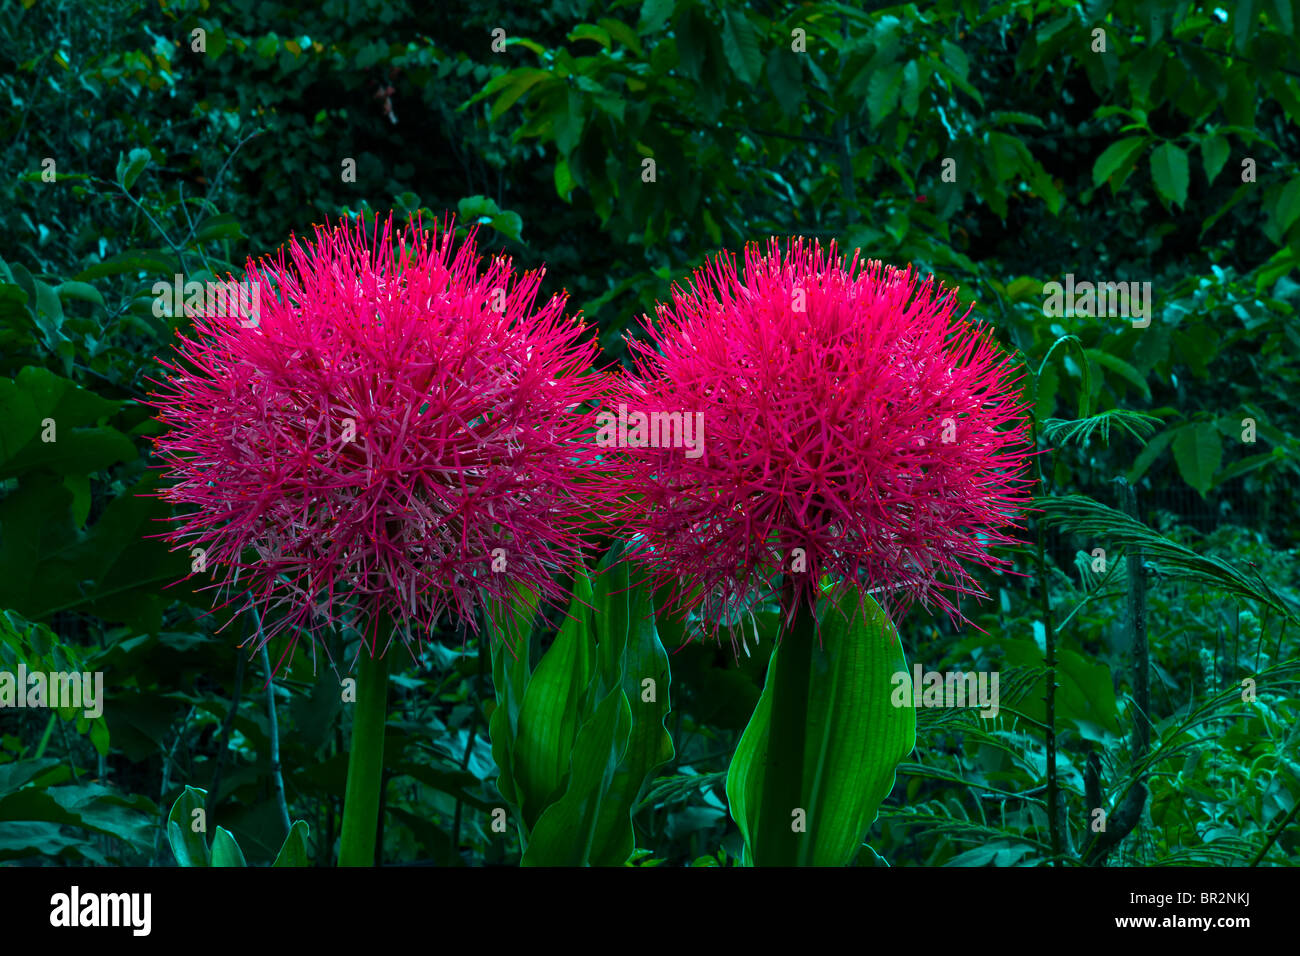 Blood Lily/Football Lily Scadoxus multiflorus, Haemanthus multiflorus - Stock Image